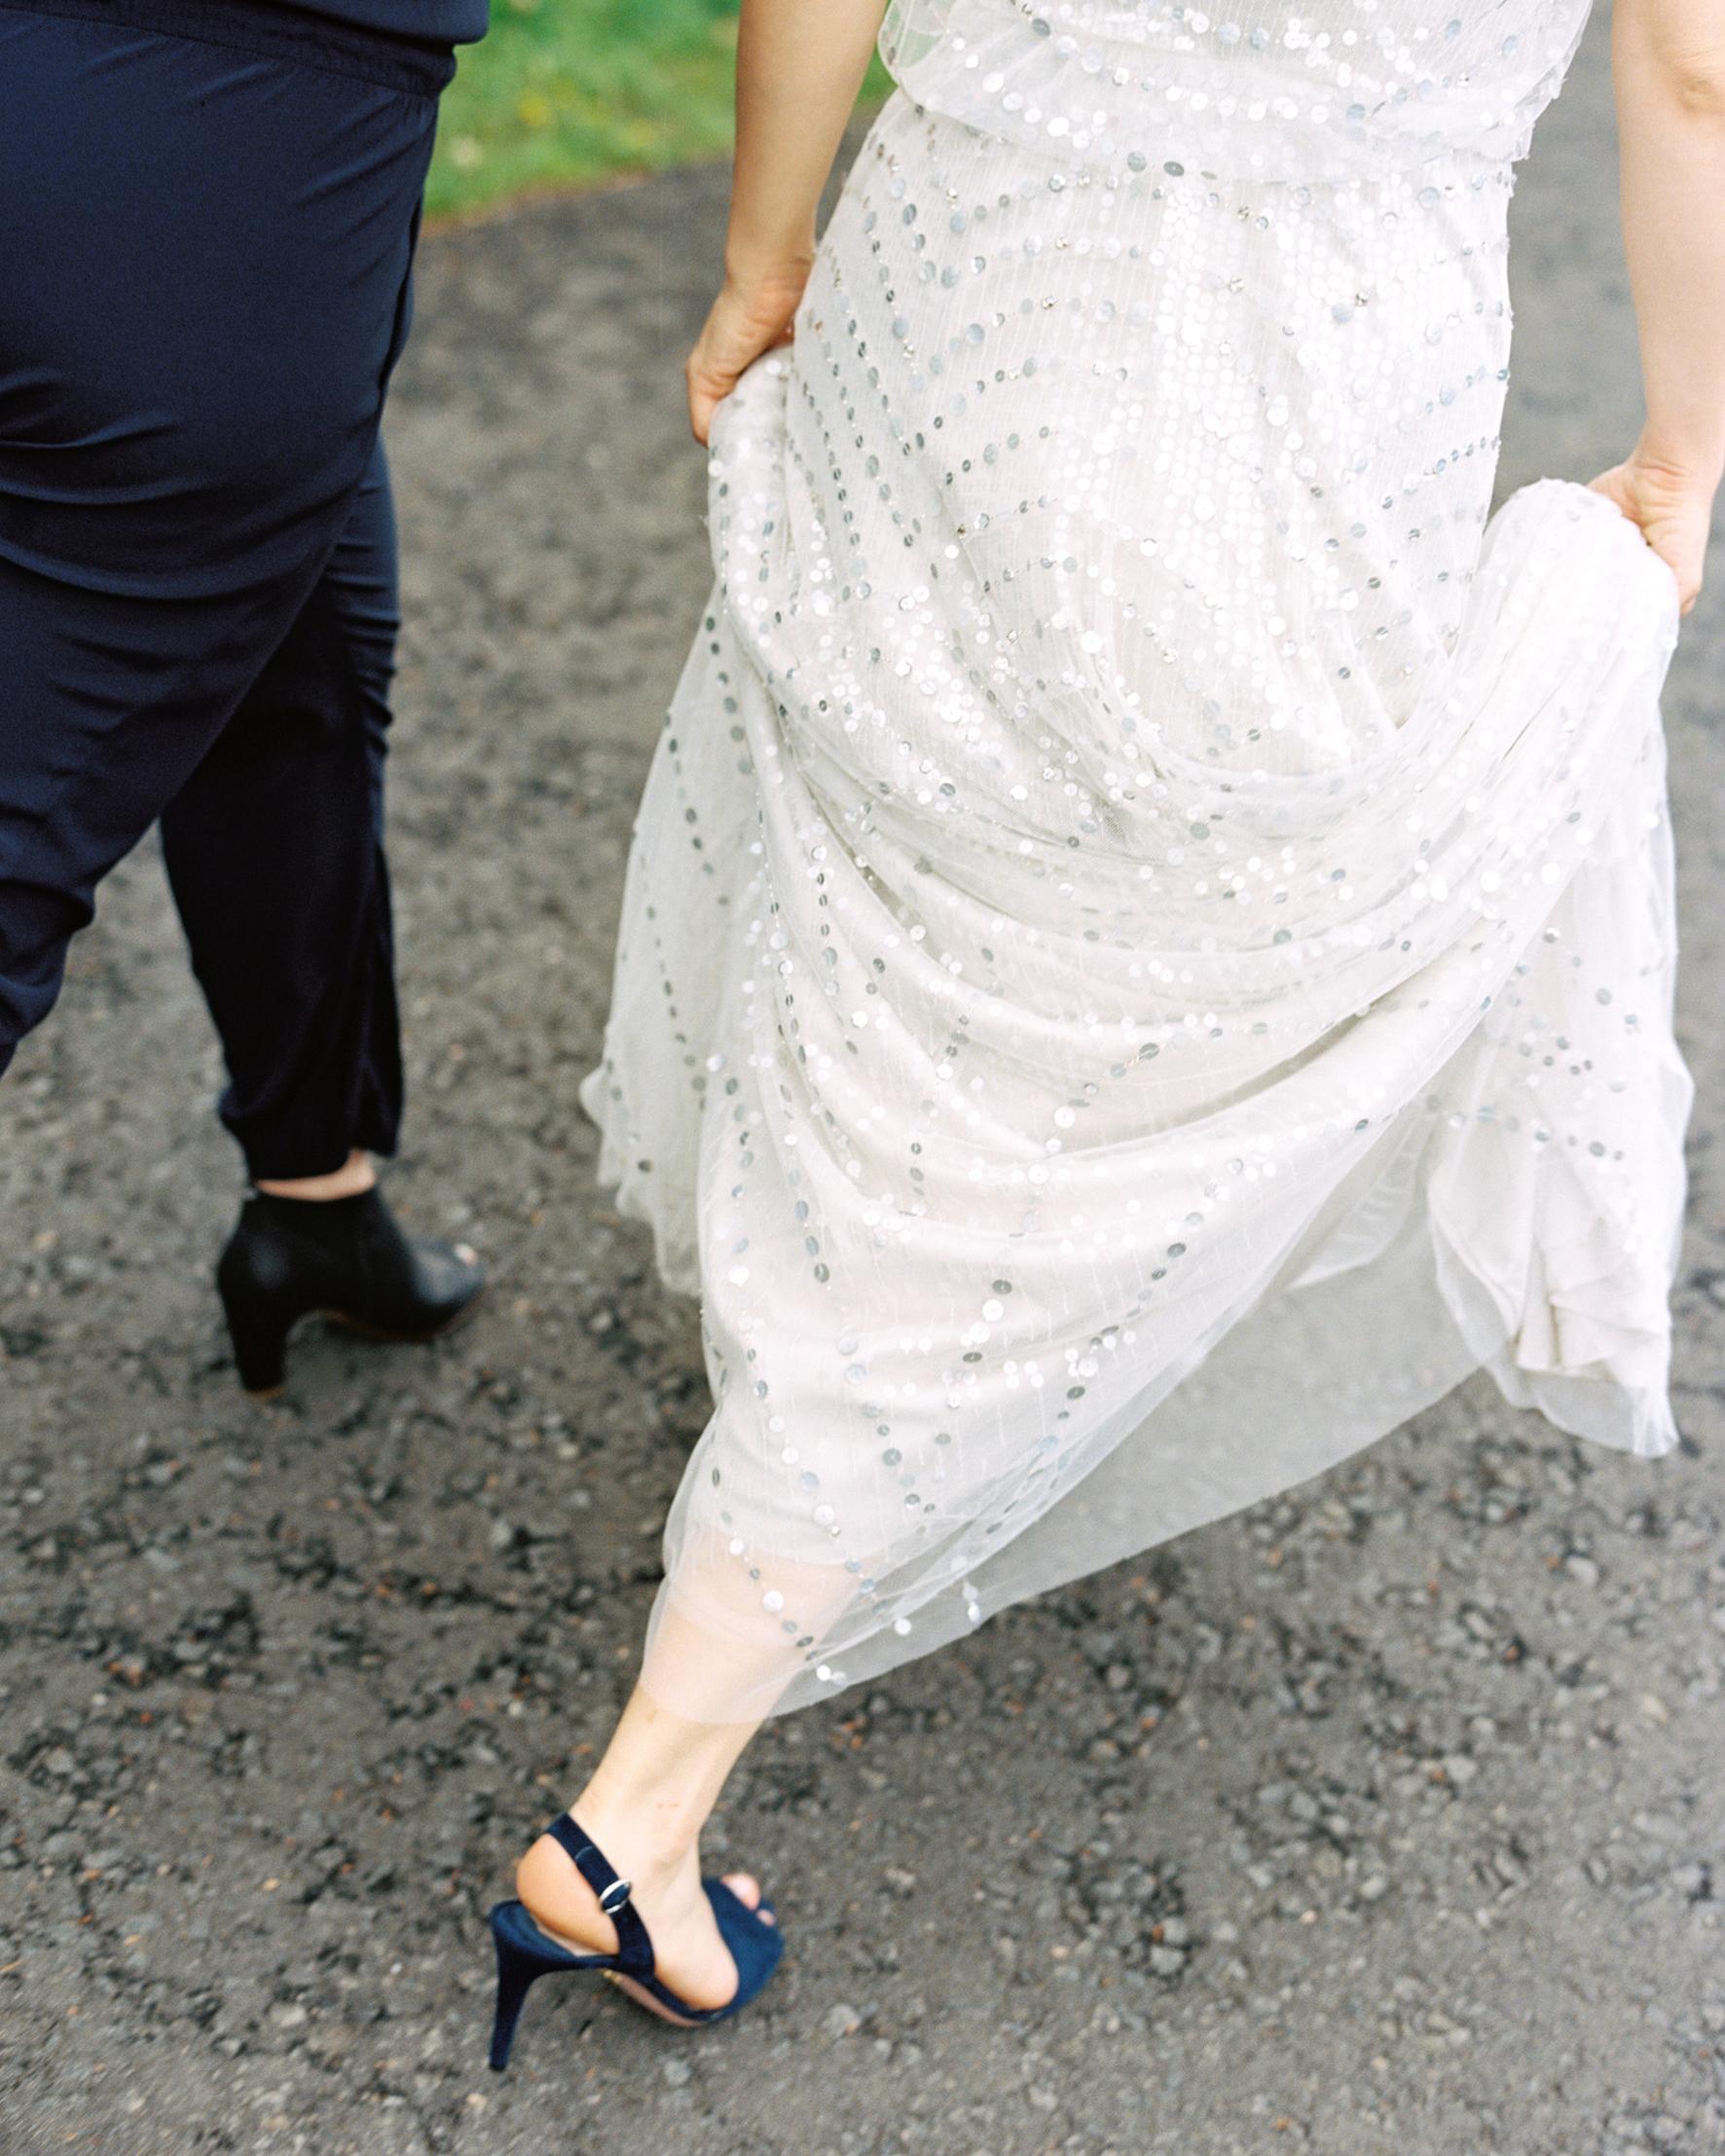 sydney-christina-wedding-shoes-035-s111743-0115.jpg